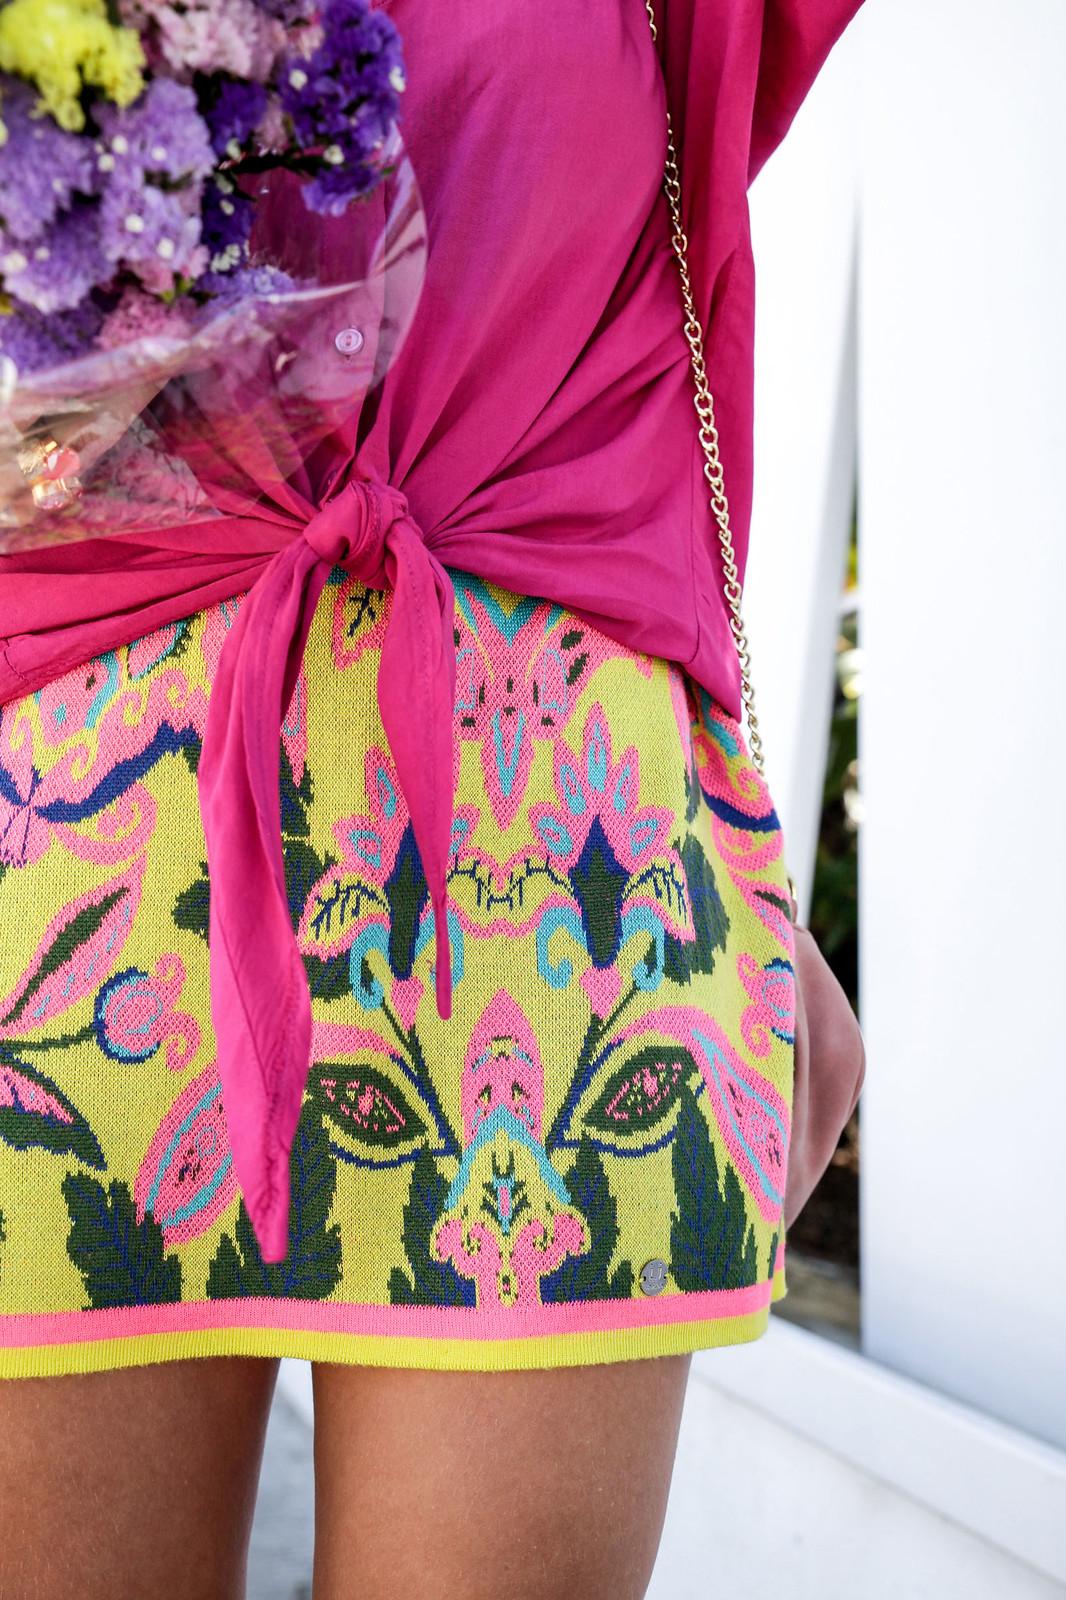 09_blusa_magenta_falda_amarilla_outfit_ruga_summer17_theguestgirl_influencer_barcelona_portugal_brand_ambassador